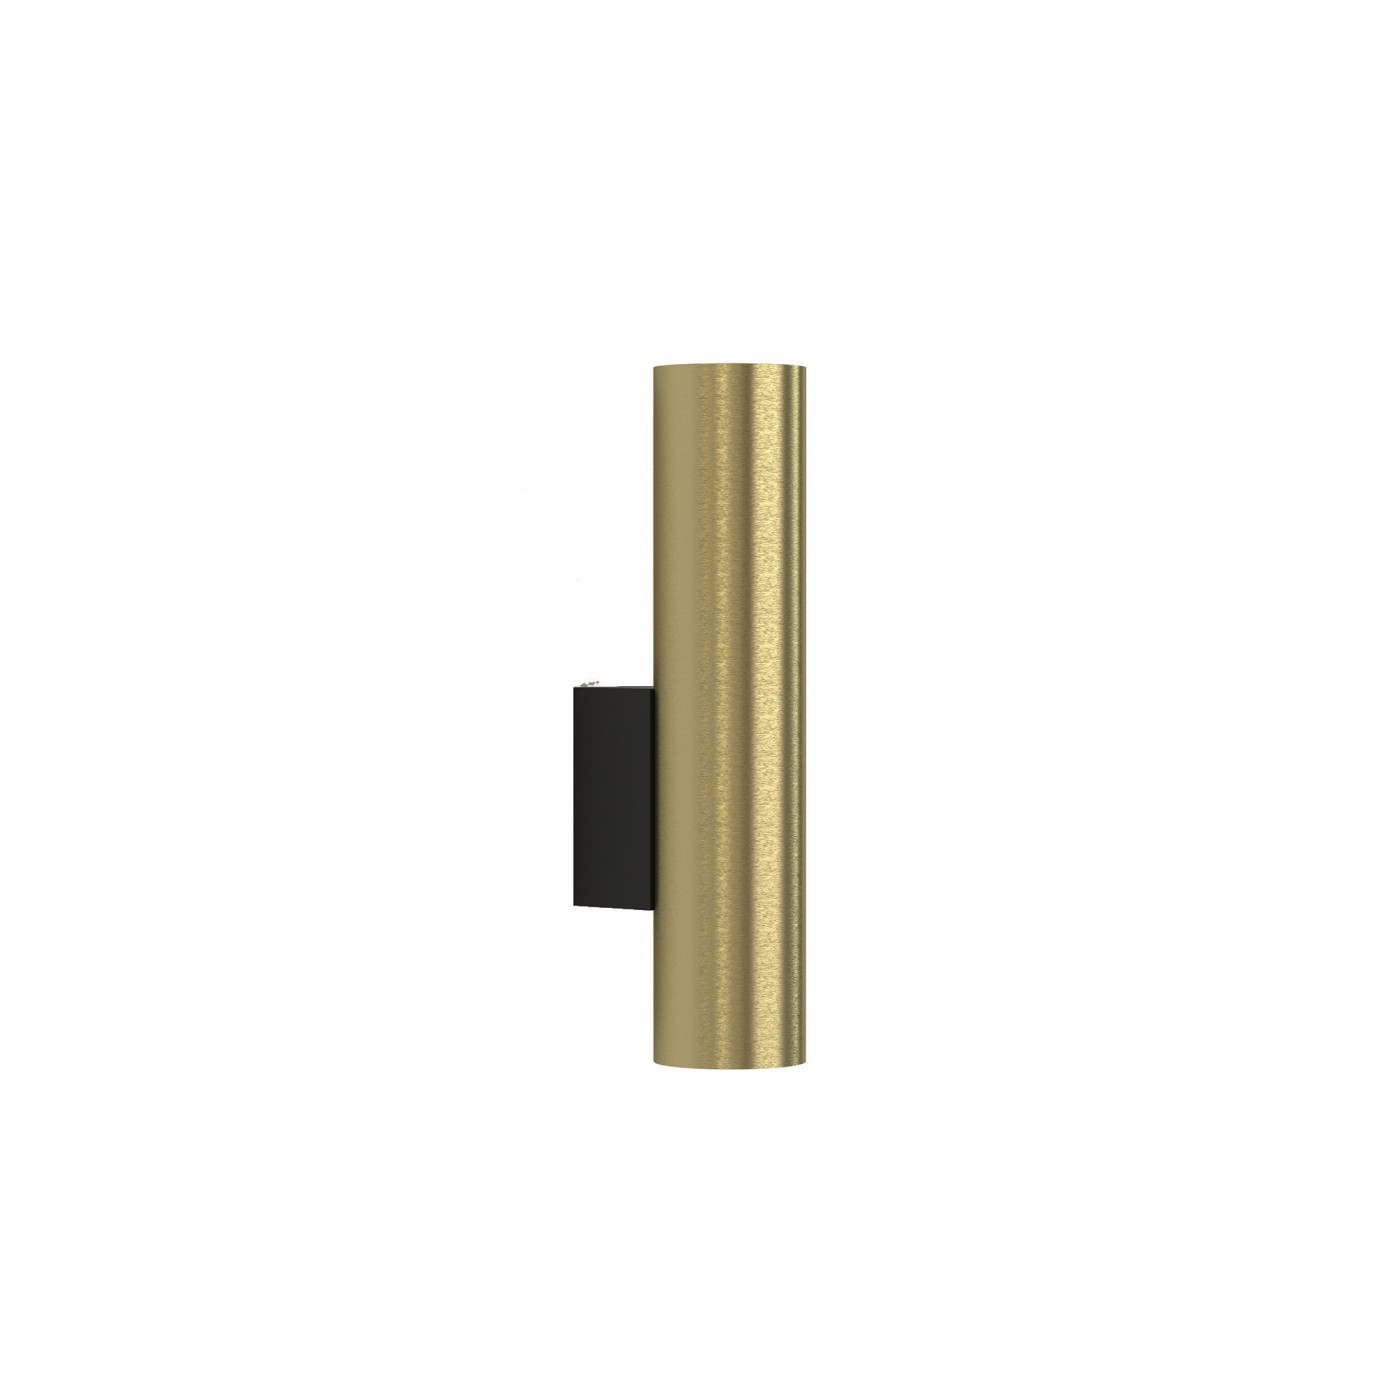 EYE WALL solid brass 8074 Nowodvorski